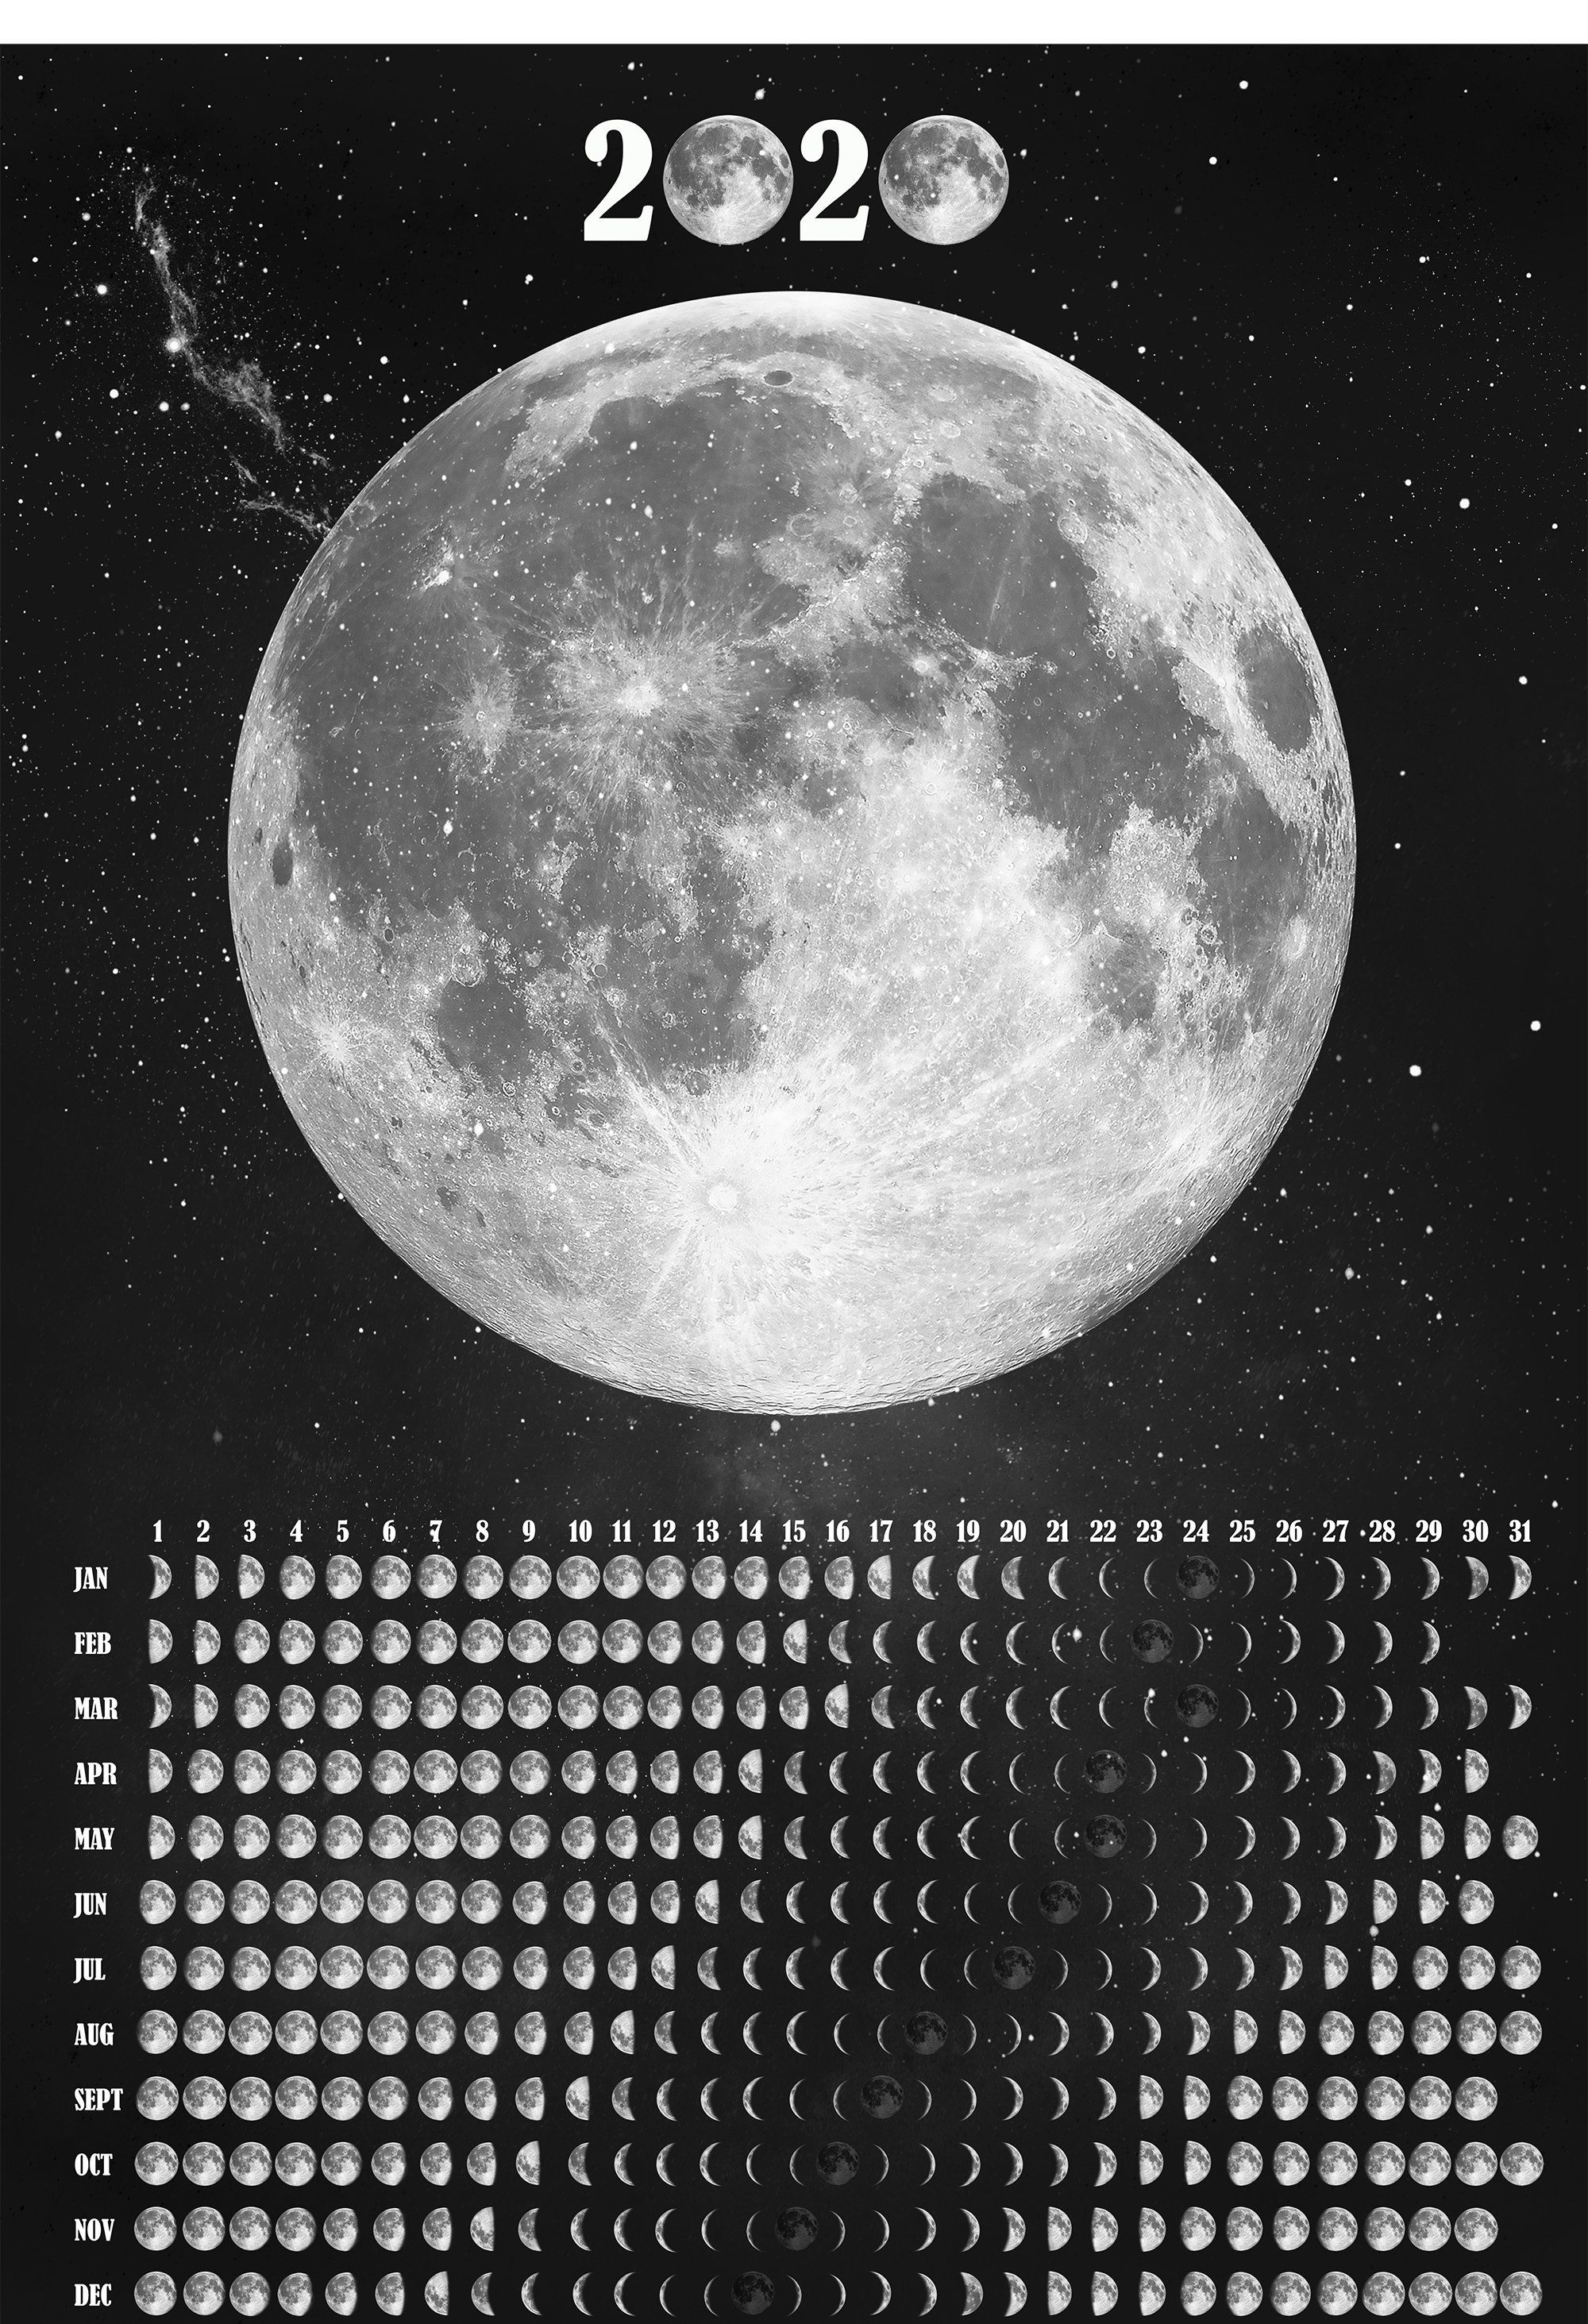 Lunar Calendar 2021 Moon Phase Wall Calendar Galaxy Print Moon Phase Poster Space Poster Night Sky Print Witch Halloween Gift Moon Phase Calendar Moon Phases Moon Calendar